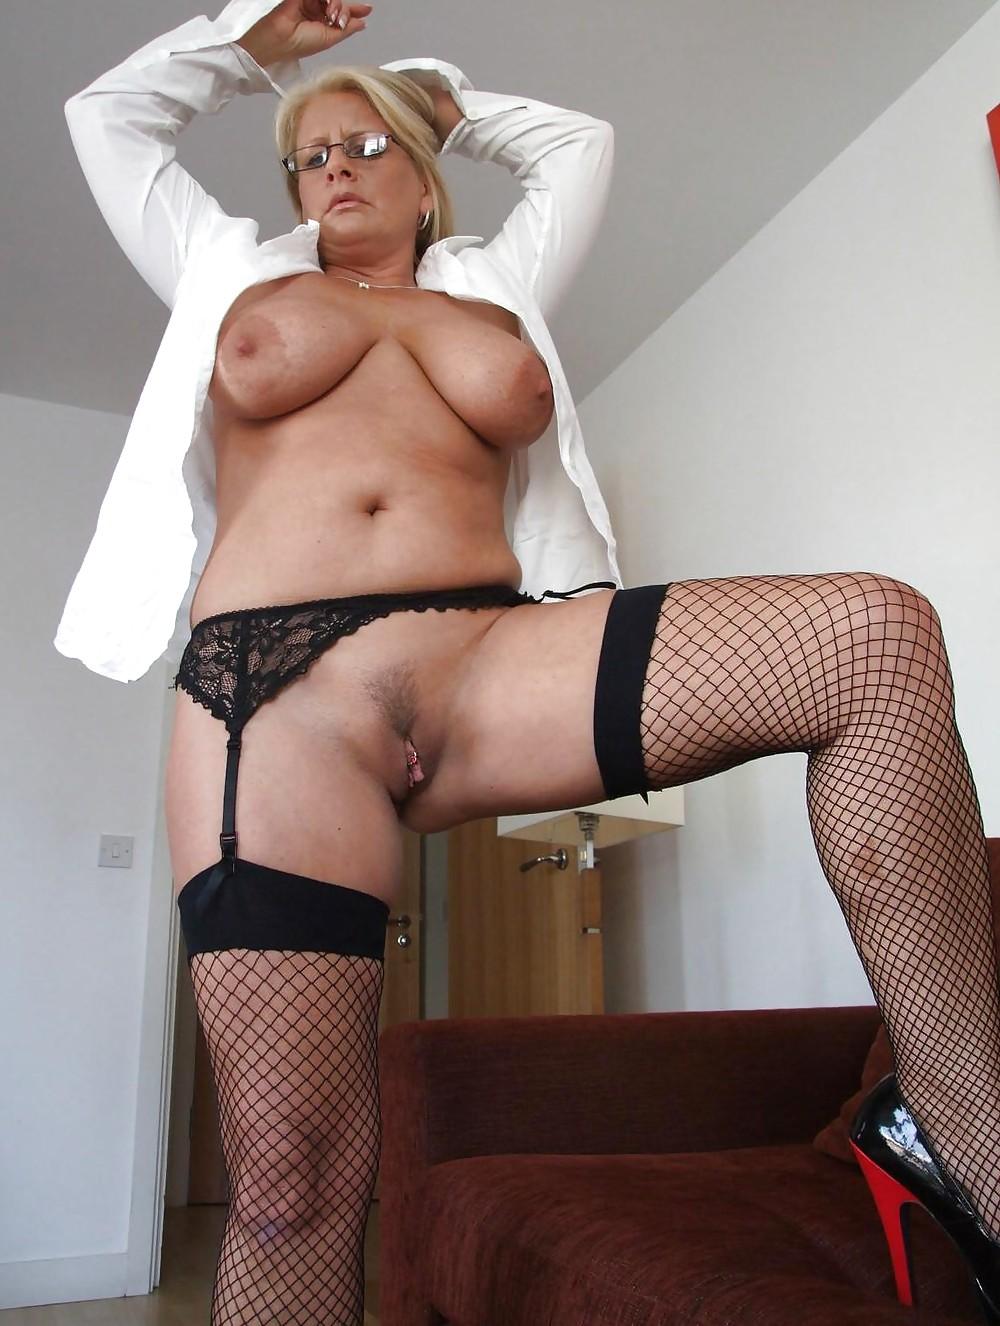 http://hotamateurmature.com/gallery/Housewives_milf_mature_elders/20.jpg